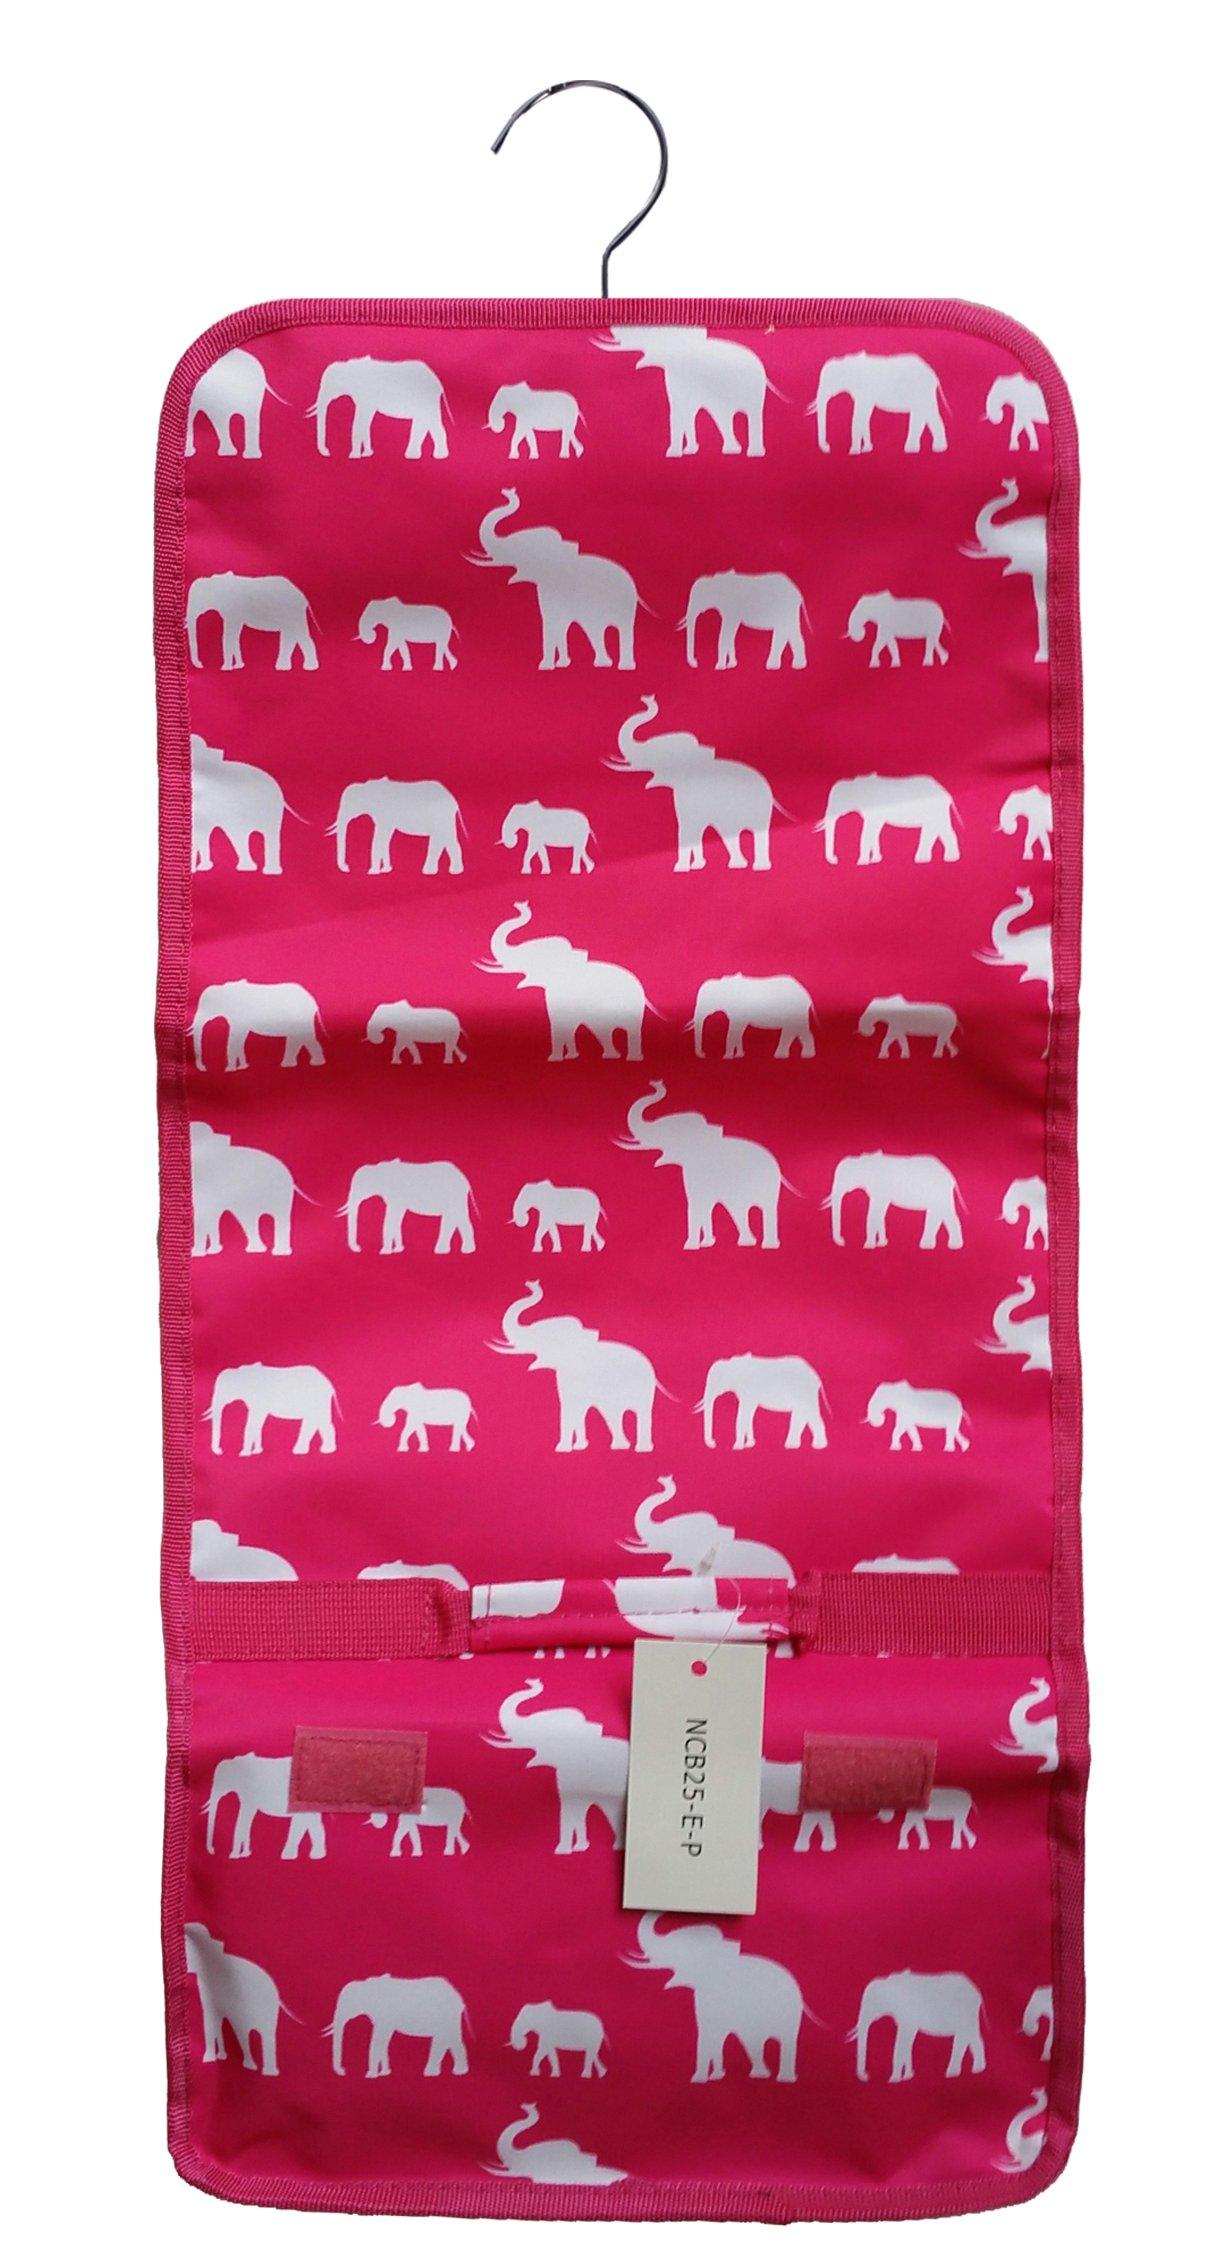 April Fashions NCB25-E-P Pink White Elephant Hanging and Folding Cosmetic Organizer Storage